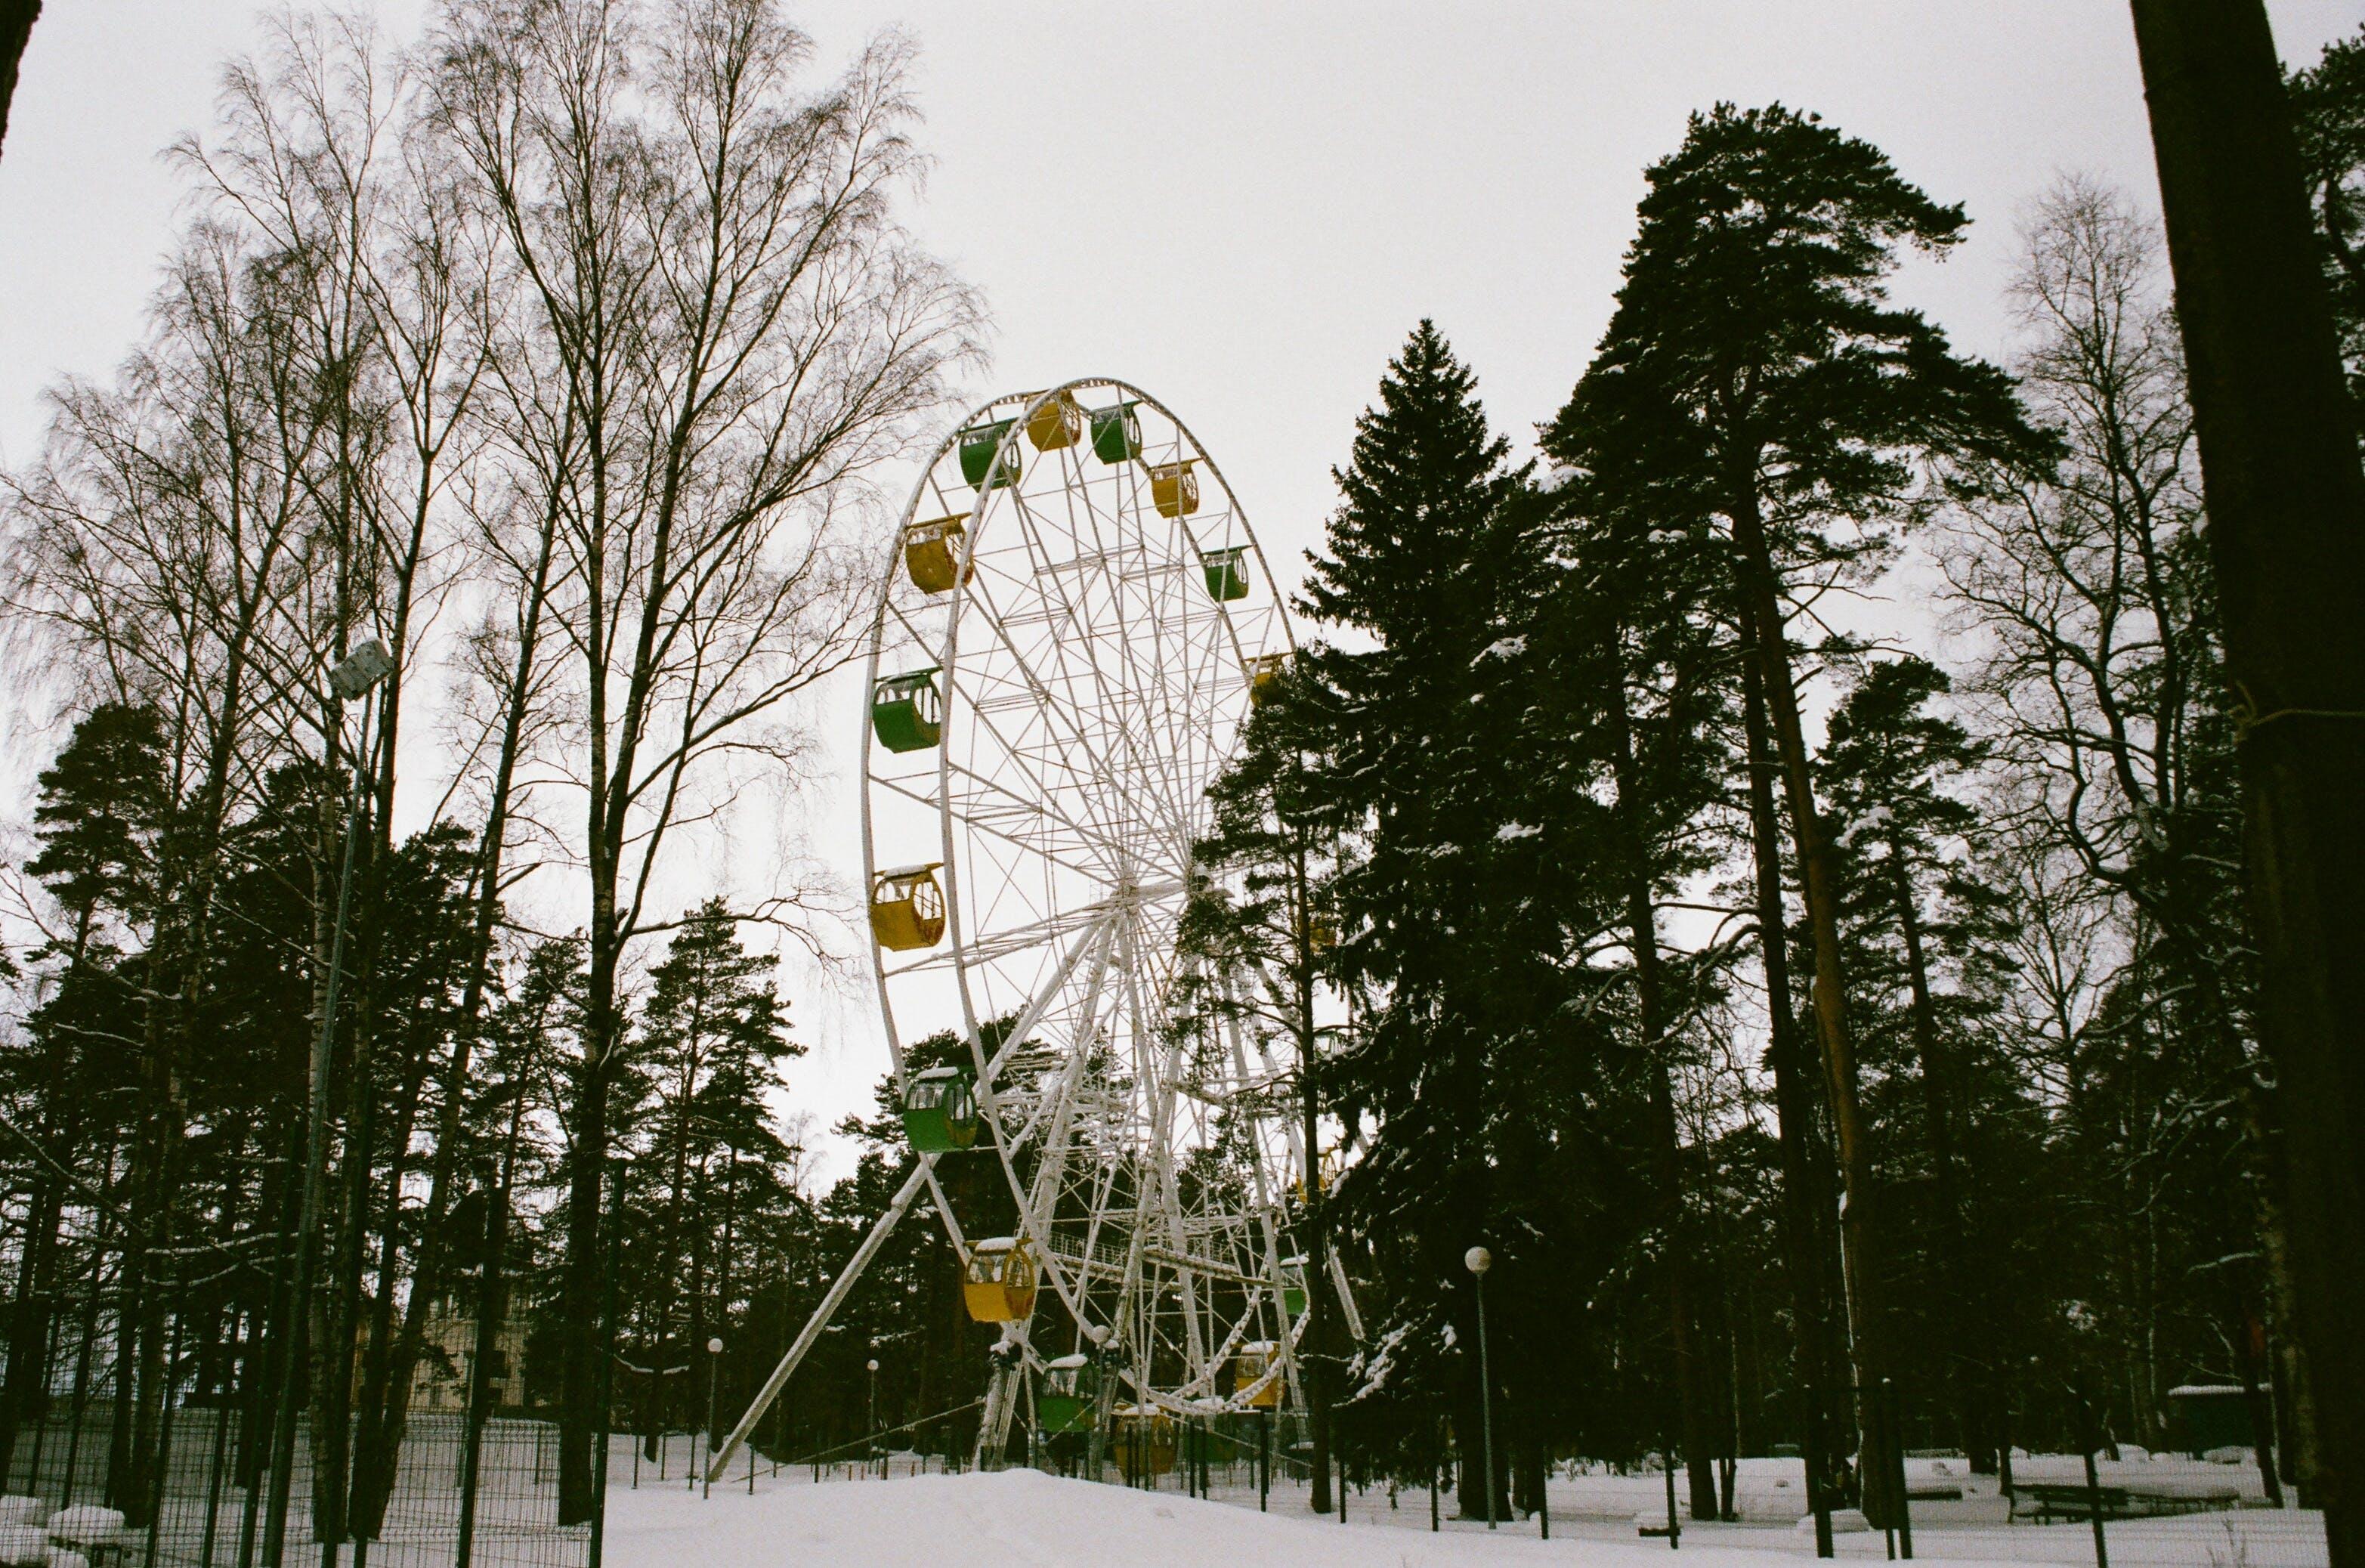 Ferris Wheel during Winter